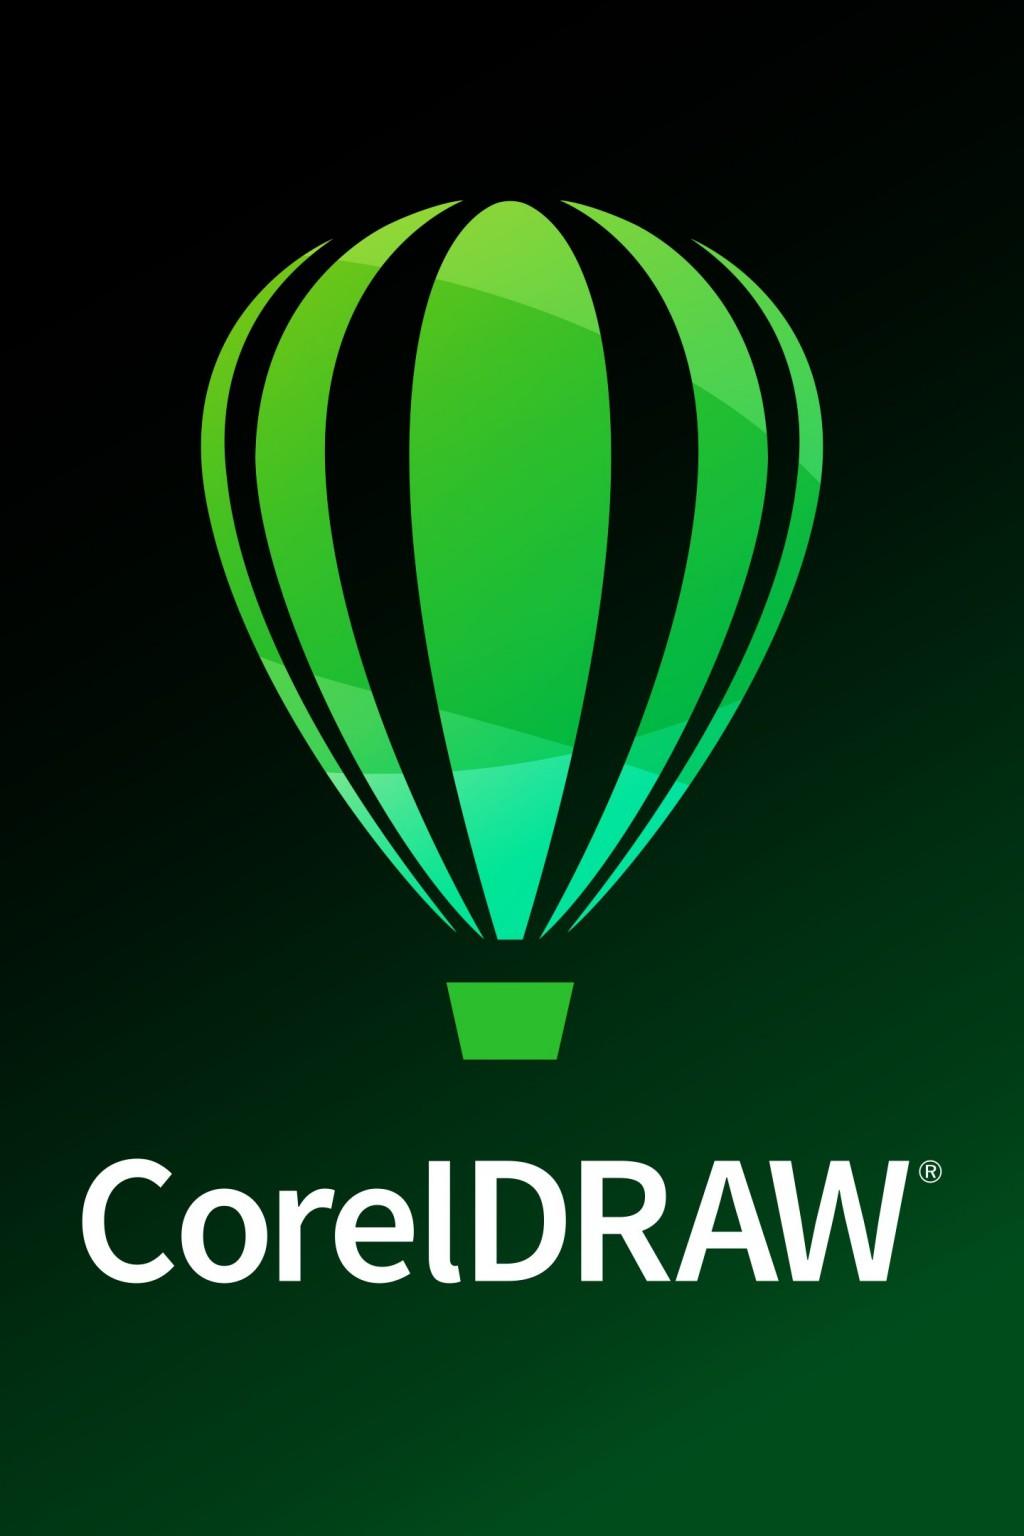 Các phím tắt CorelDRAW